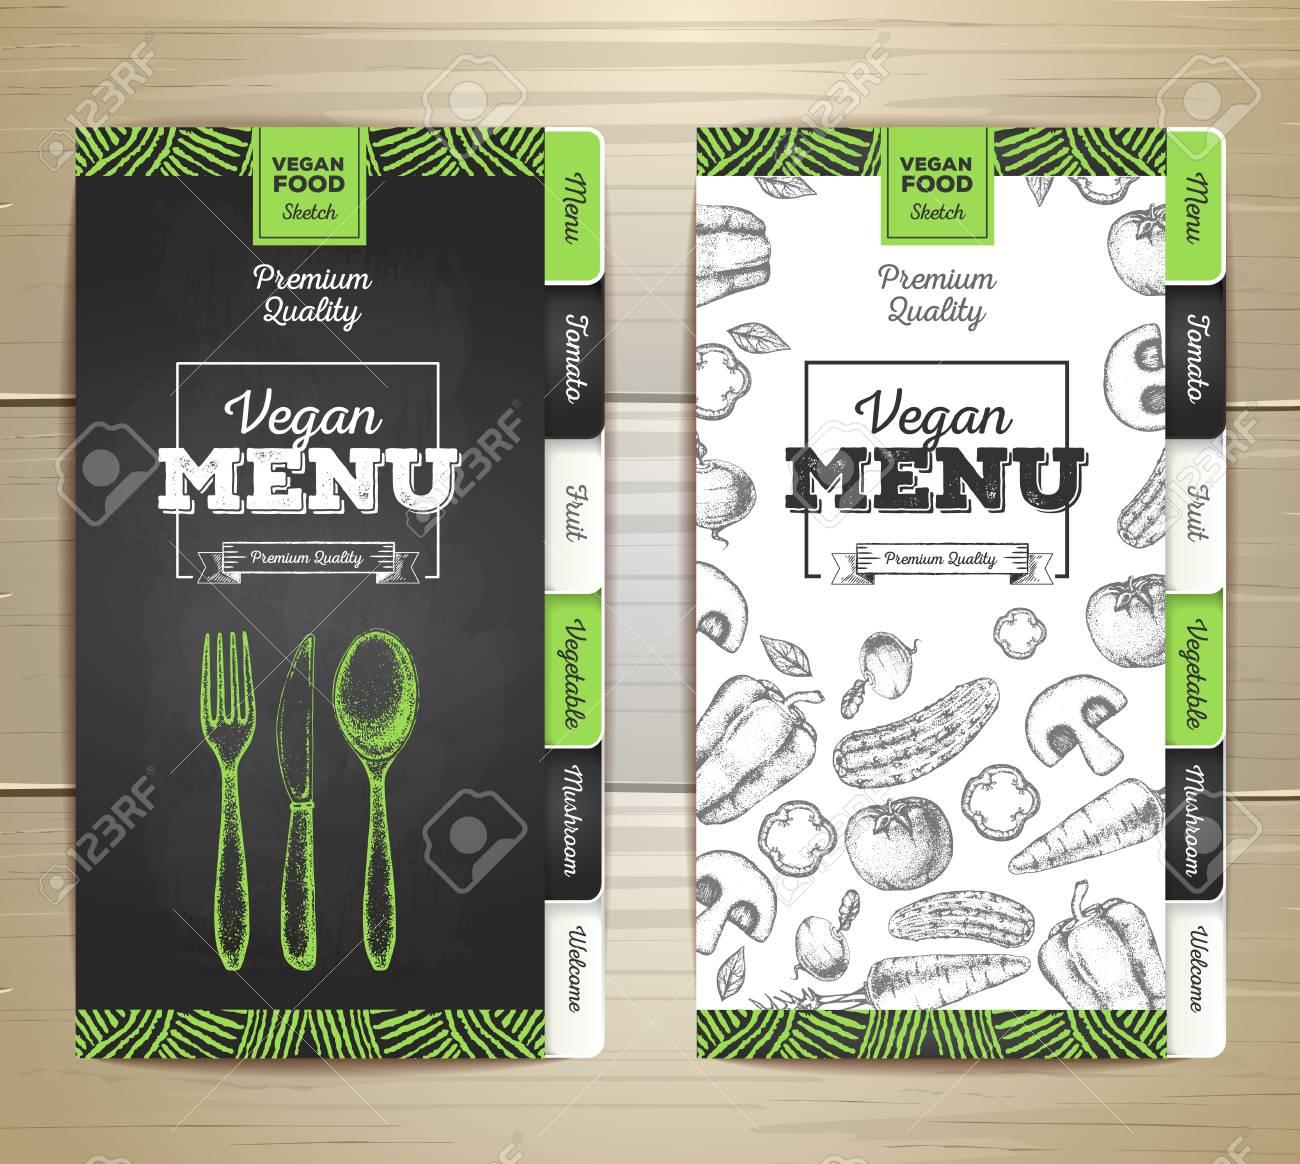 1300x1164 Vintage Chalk Drawing Vegetarian Menu Design. Corporate Identity